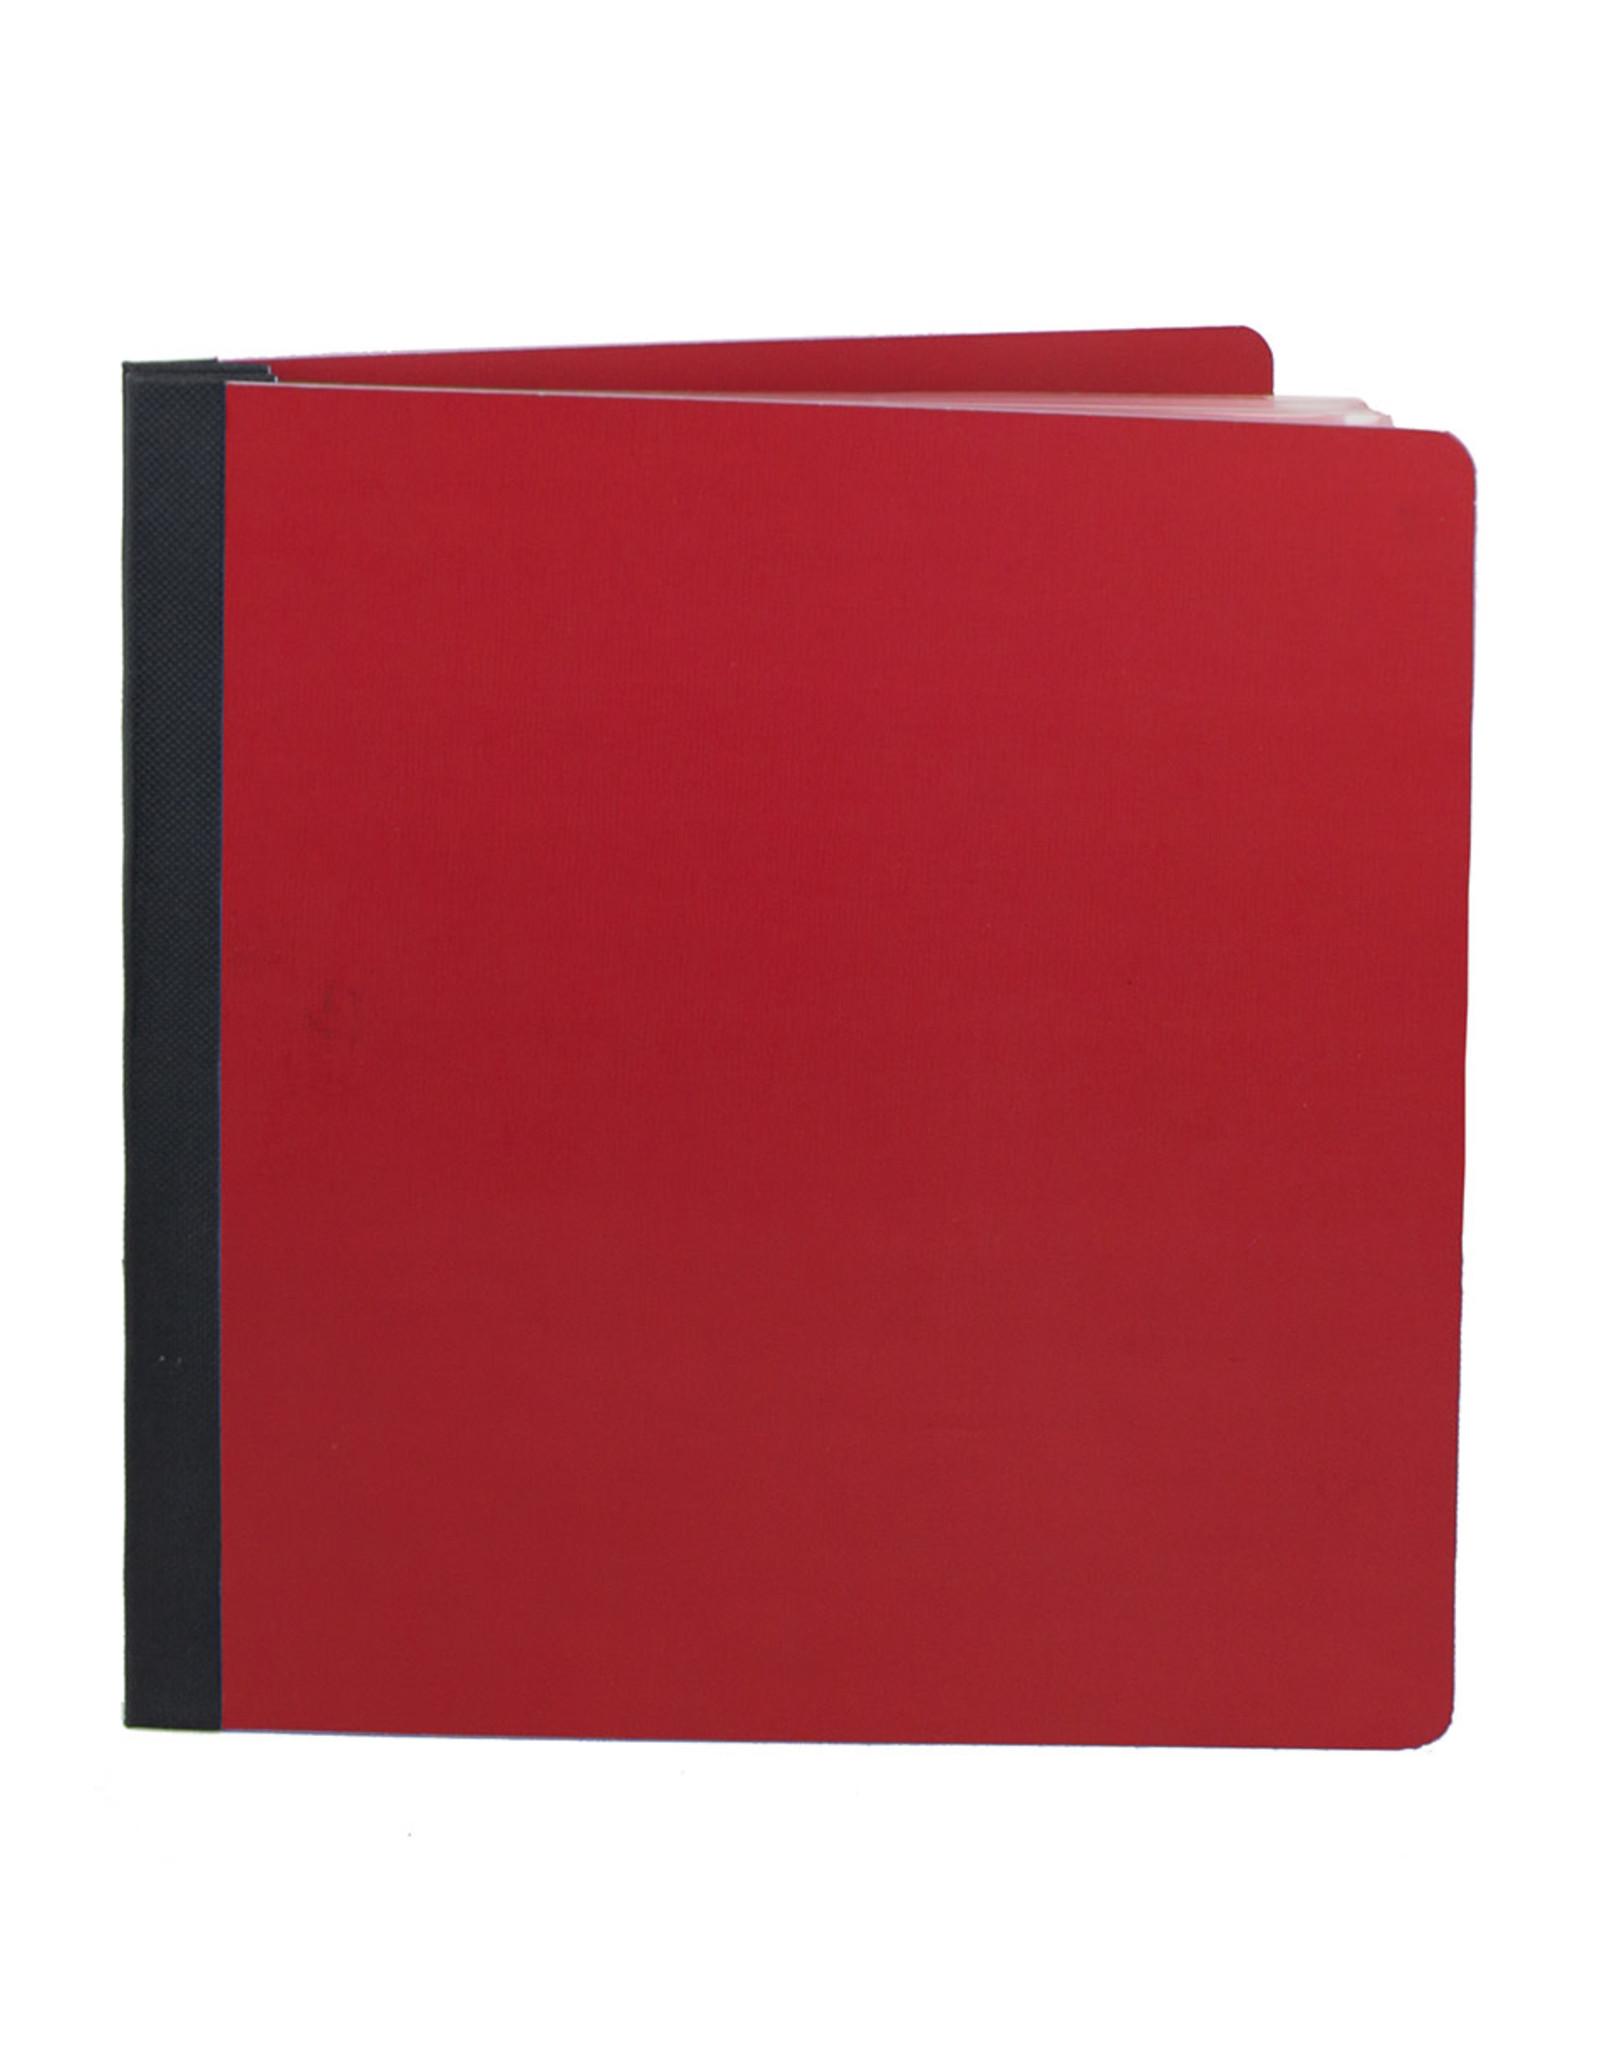 Simple Stories 6x8 SN@P! Flipbook Red